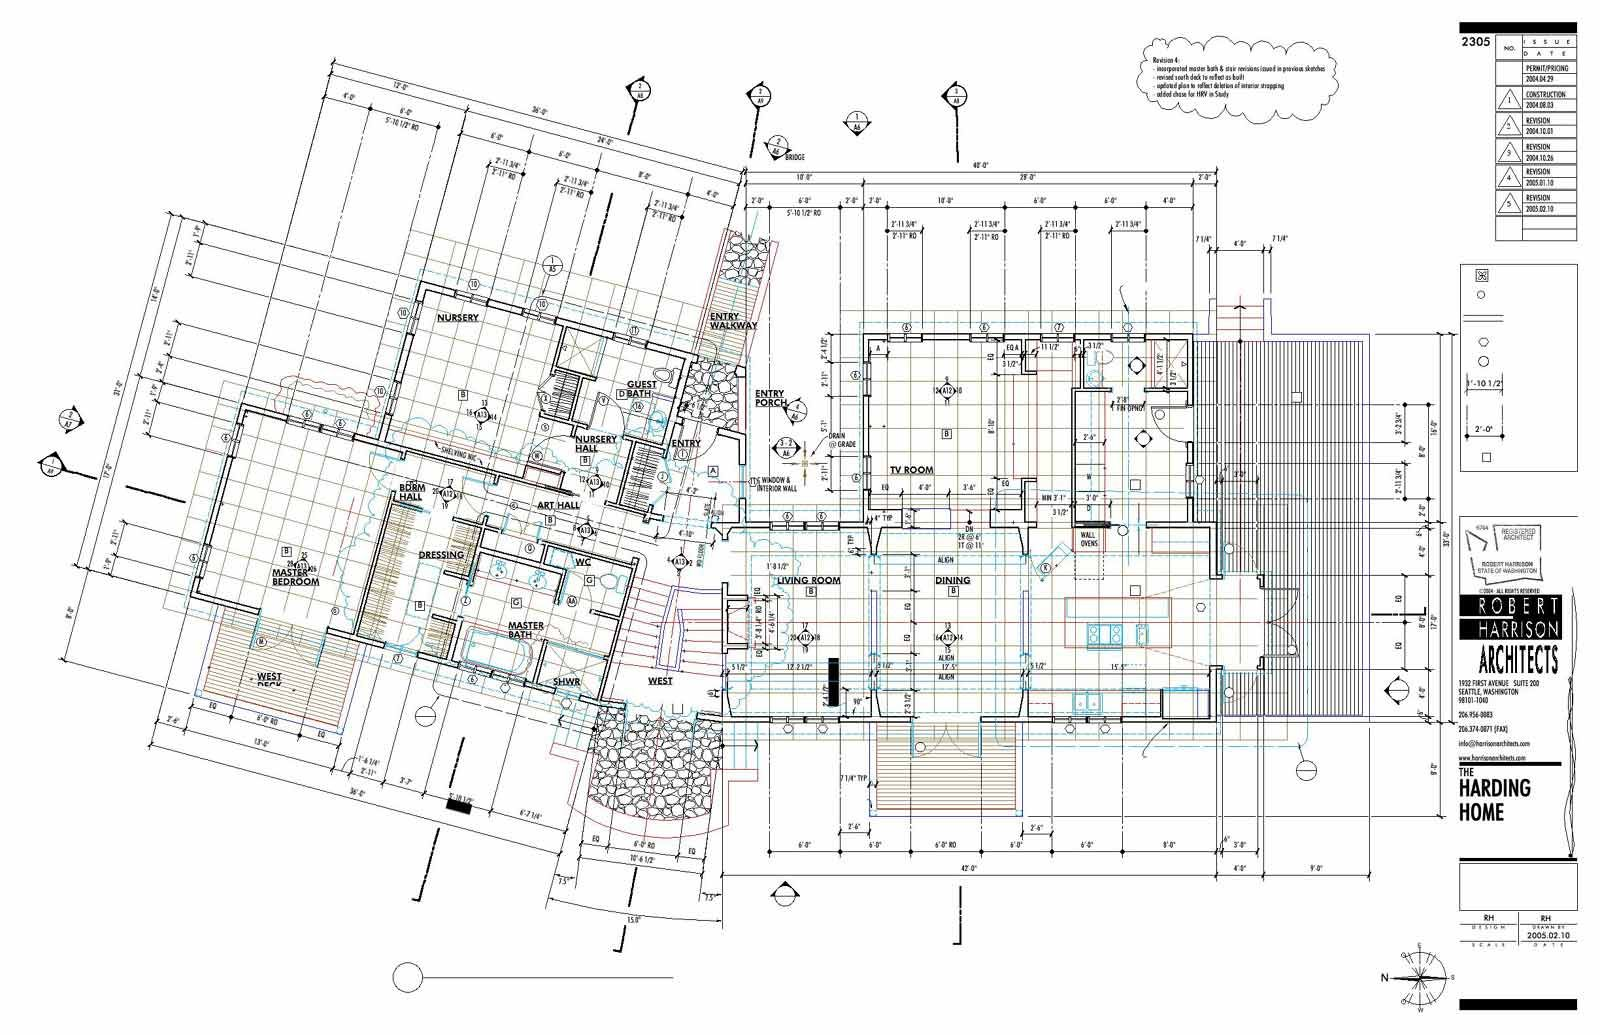 Harding Home Construction Documents Main Floor 25